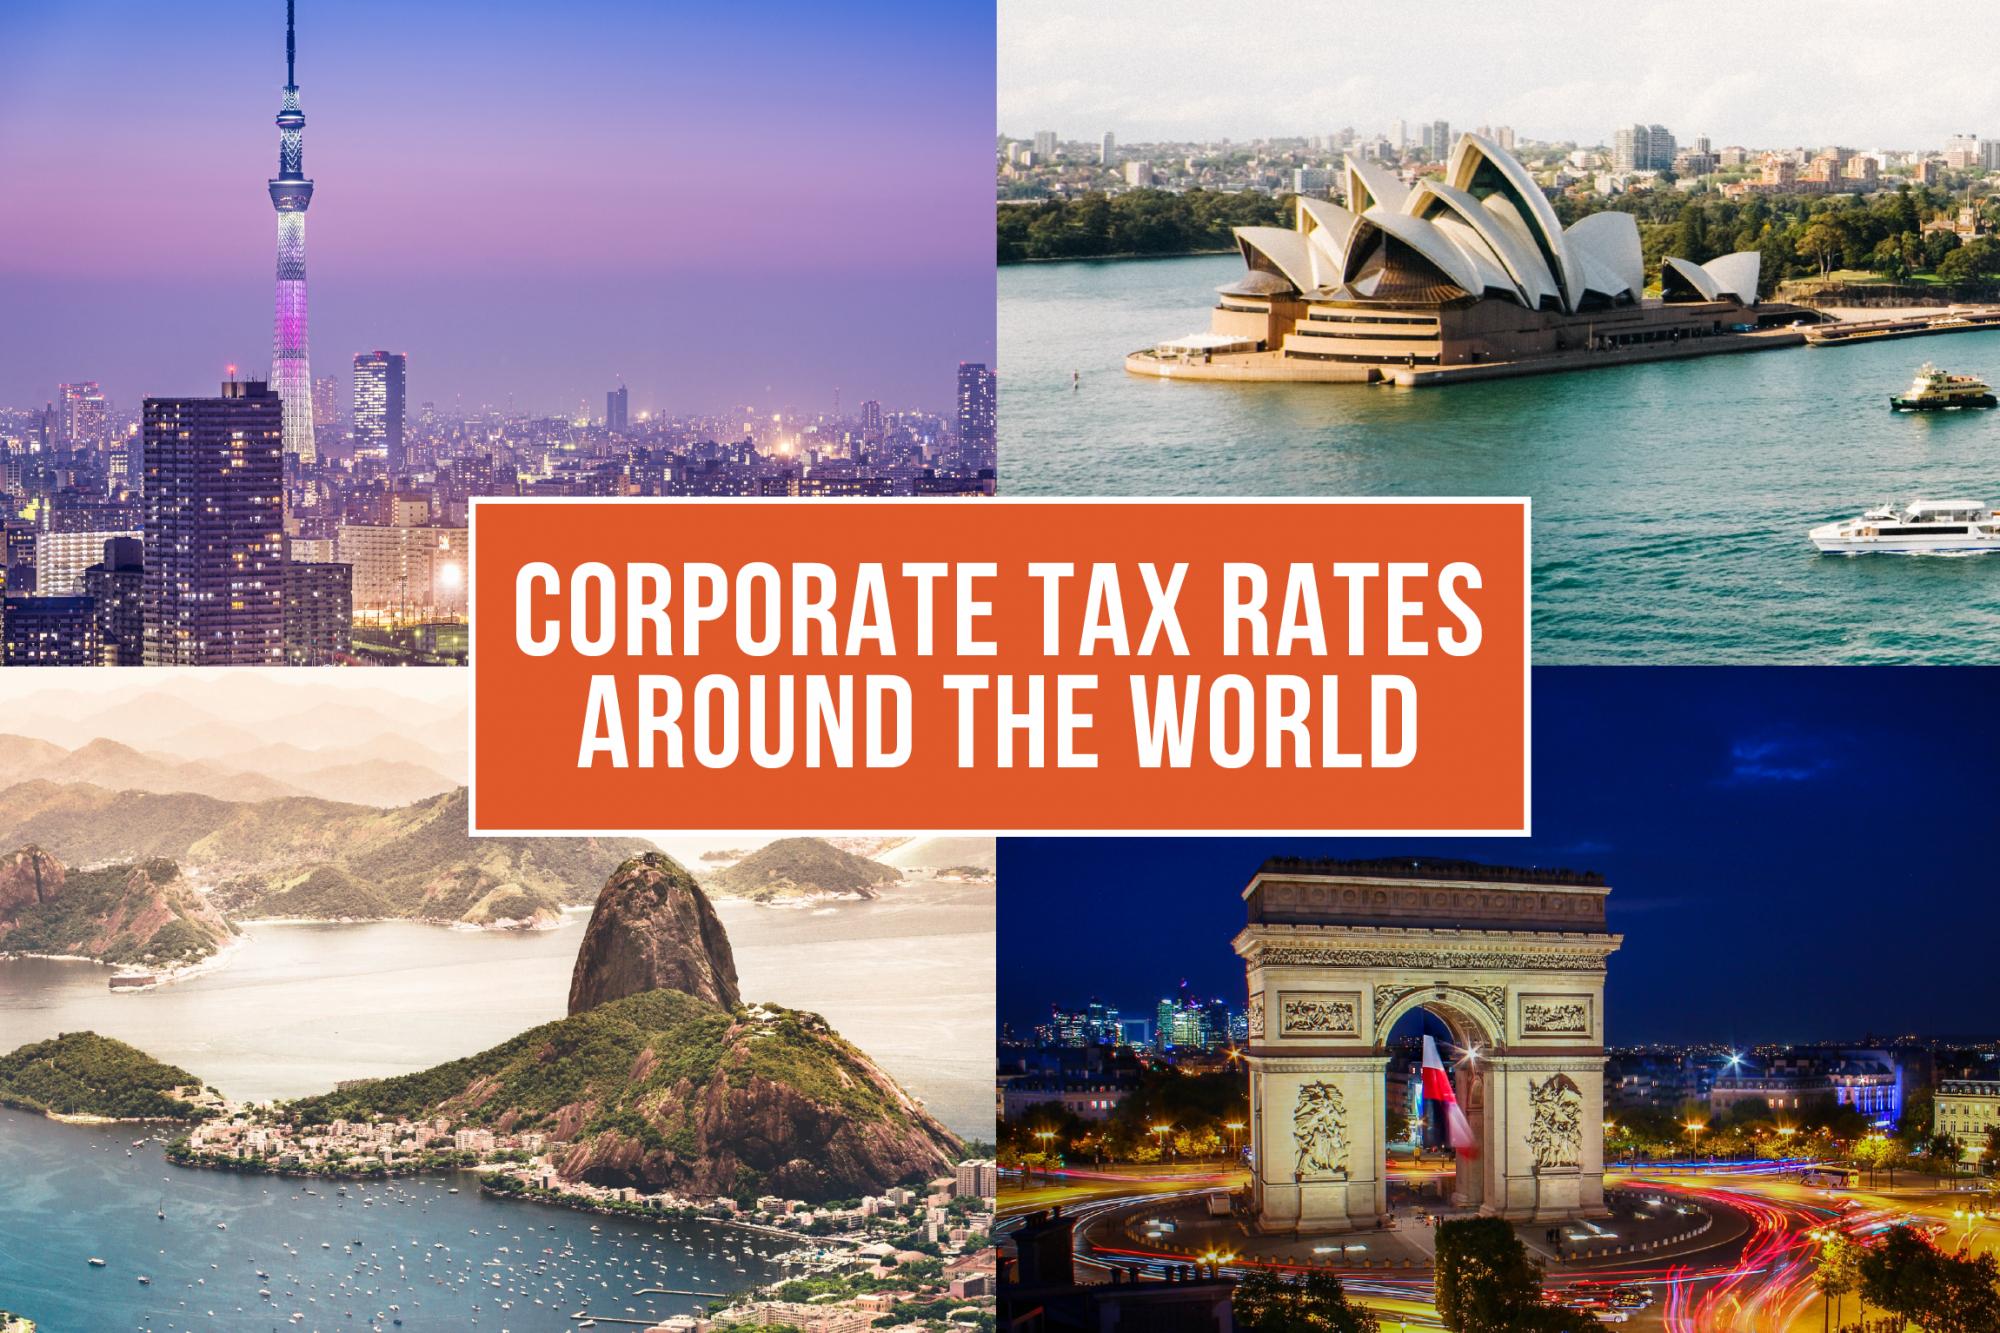 2019 corporate tax rates around the world. 2019 corporate tax trends around the world